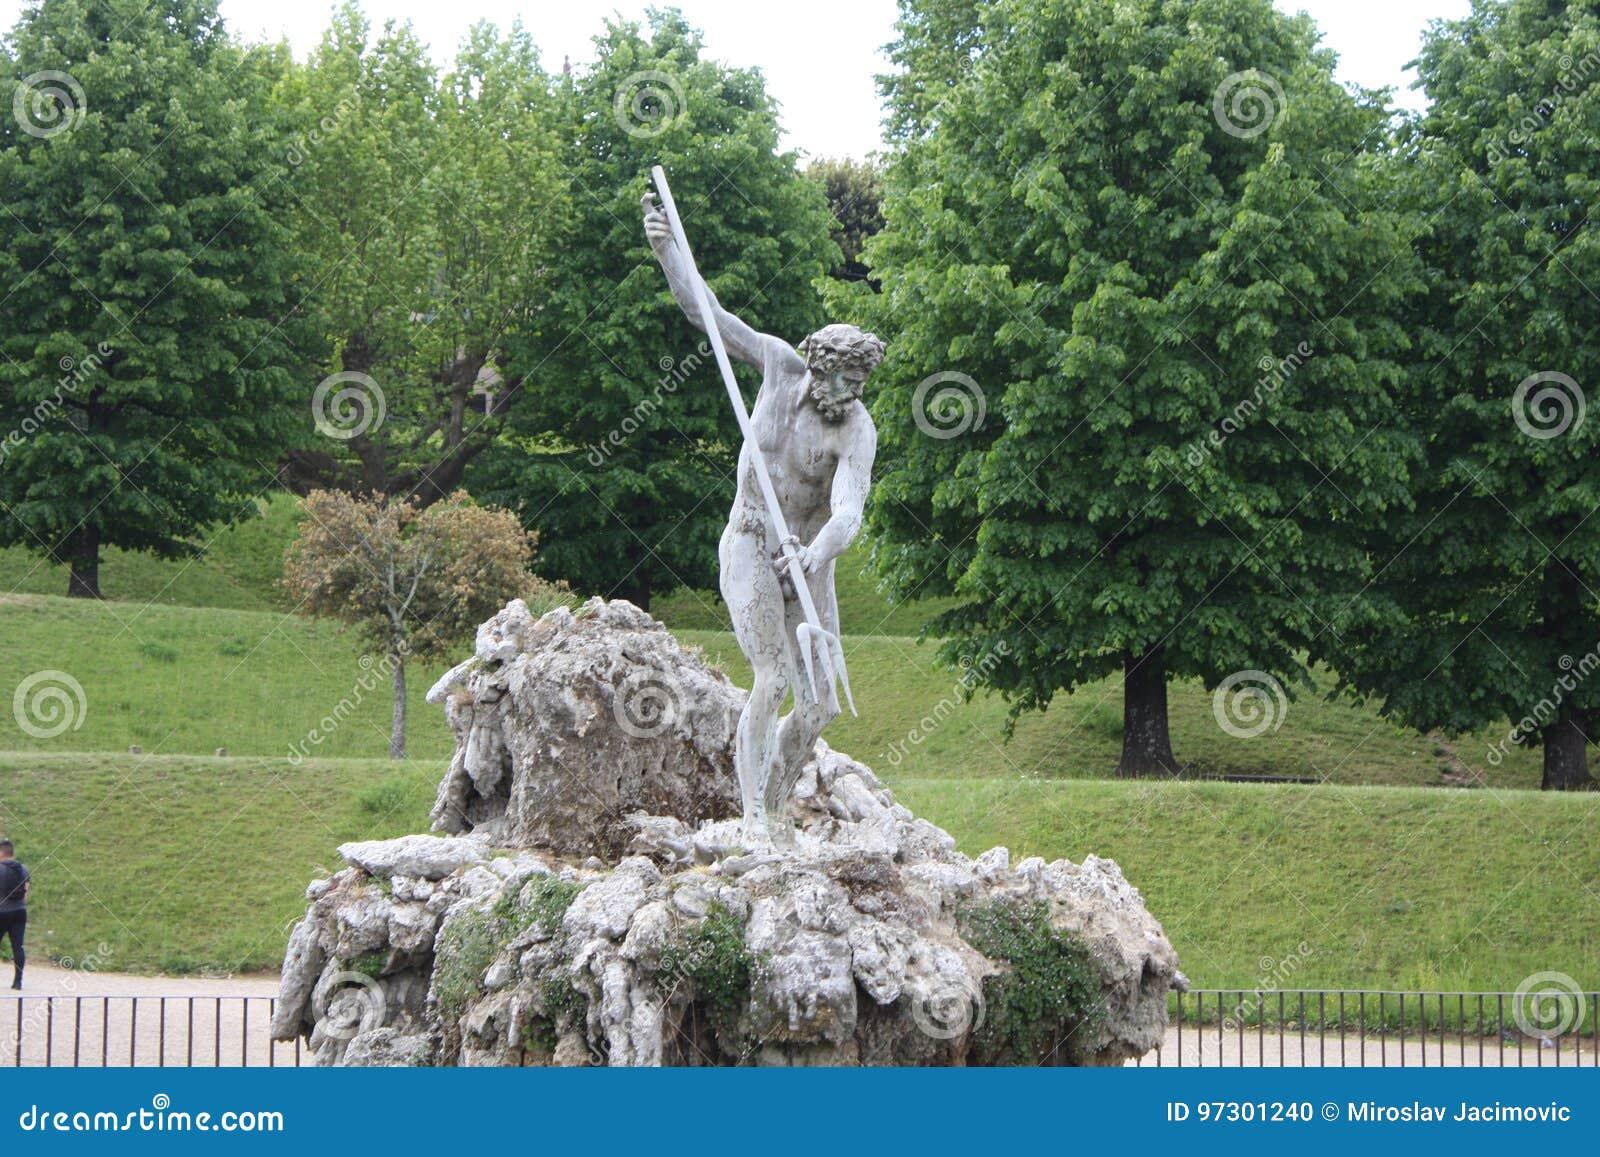 Fontaine de Neptune au centre des jardins de Boboli Le sculpteur, Stoldo Lorenzi Florence